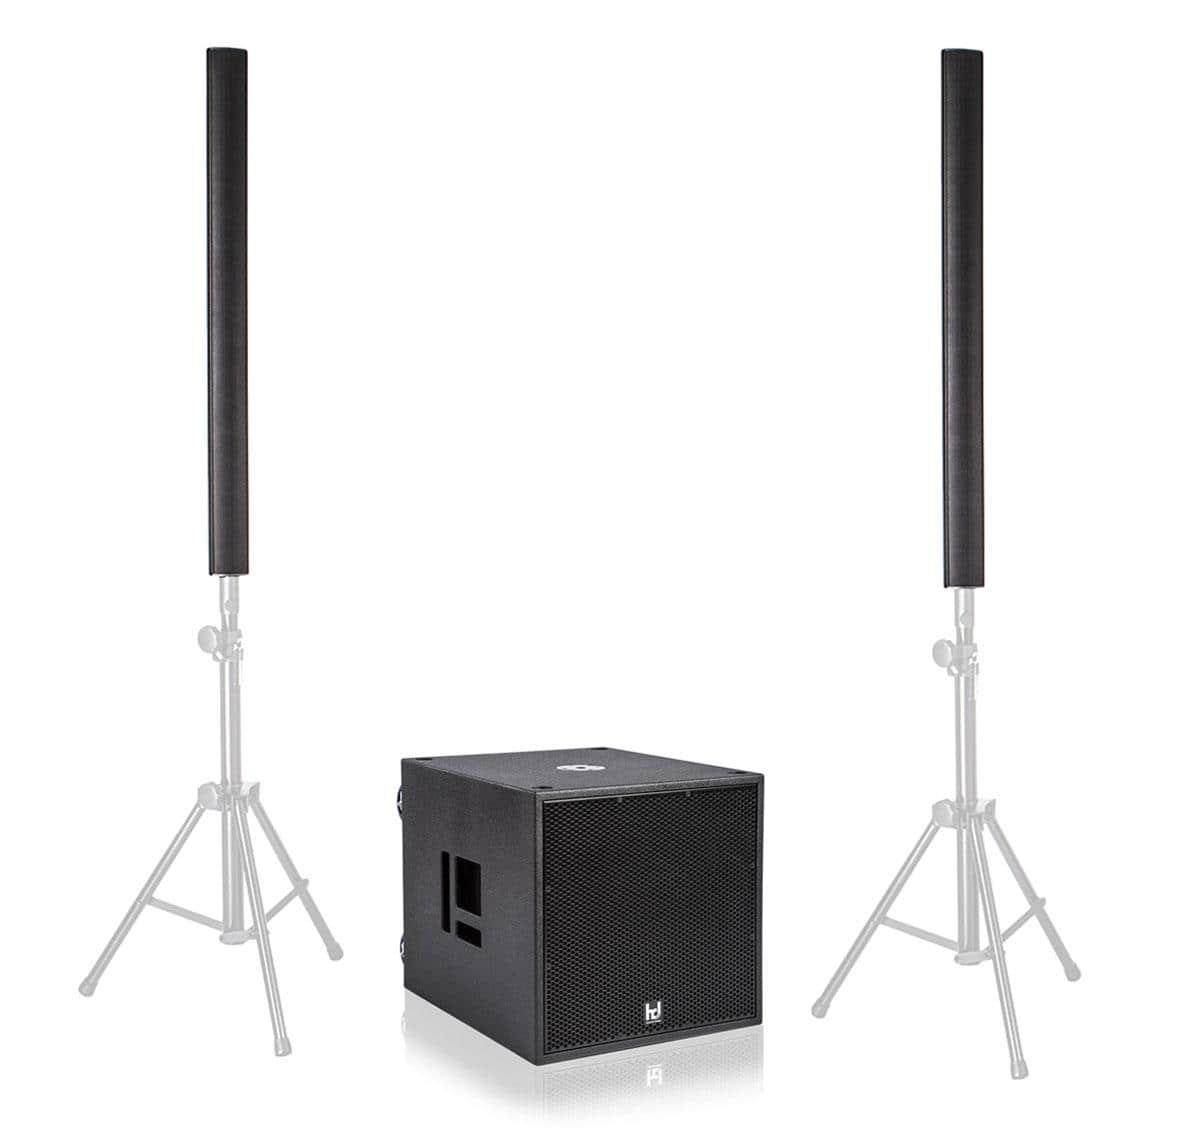 Harmonic Design PL12|P18 Basis Multi DSP Aktivsystem 3700 Watt